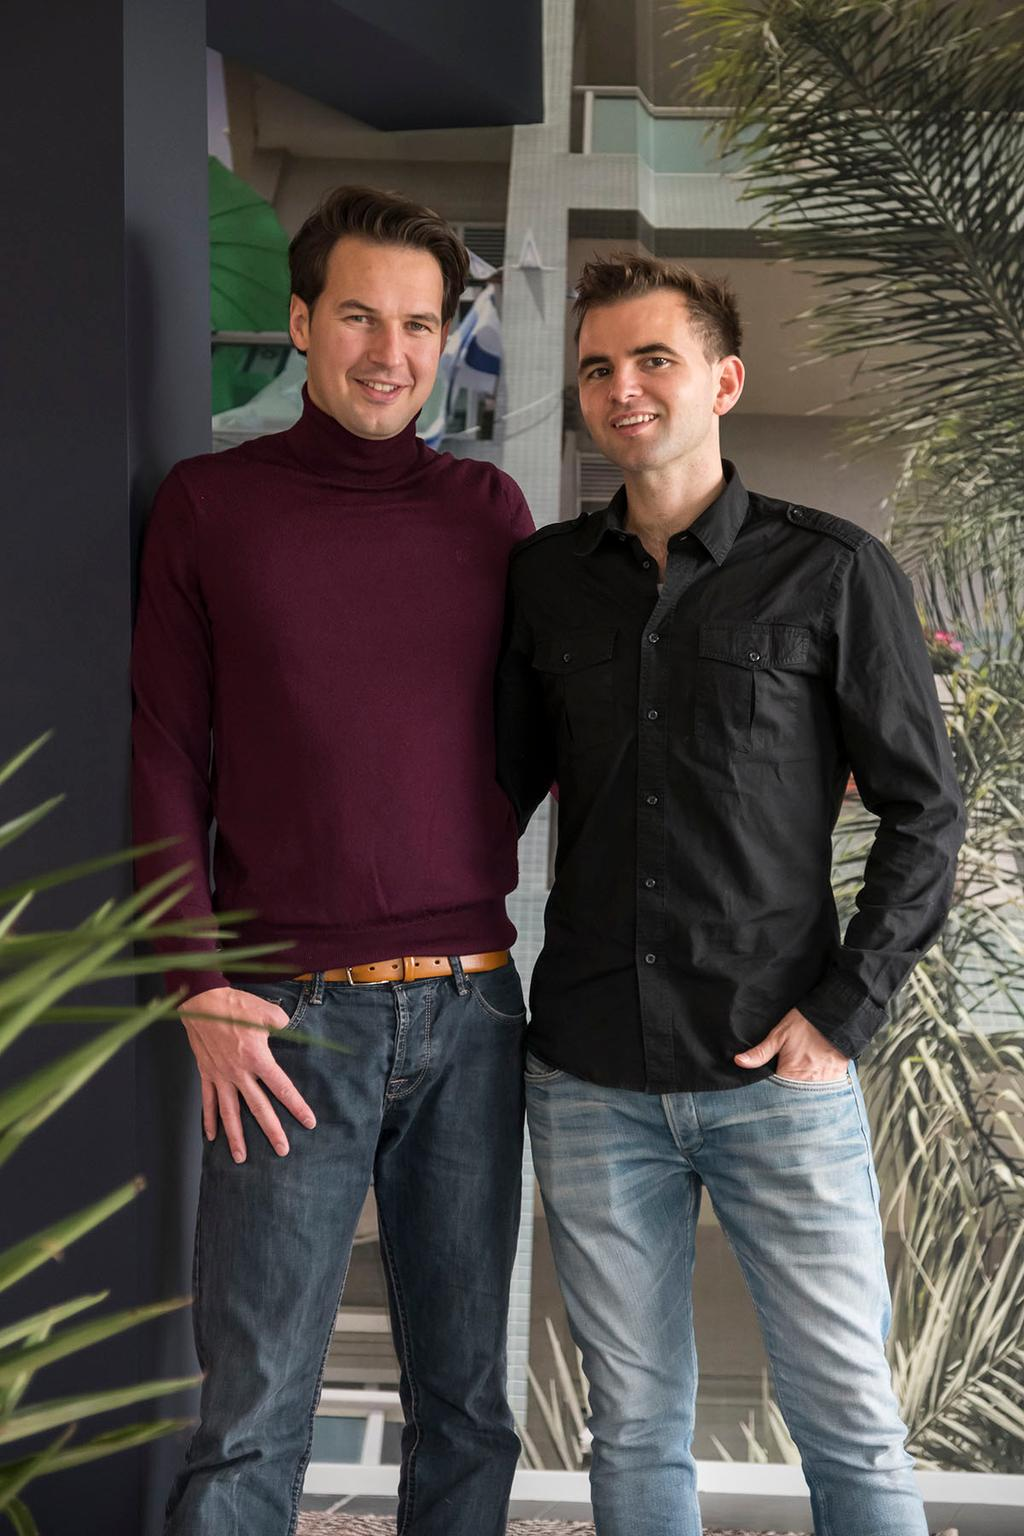 Nick & Stig - Aflevering 4 - Een frisse start met vtwonen - Fotografie Jonah Samyn